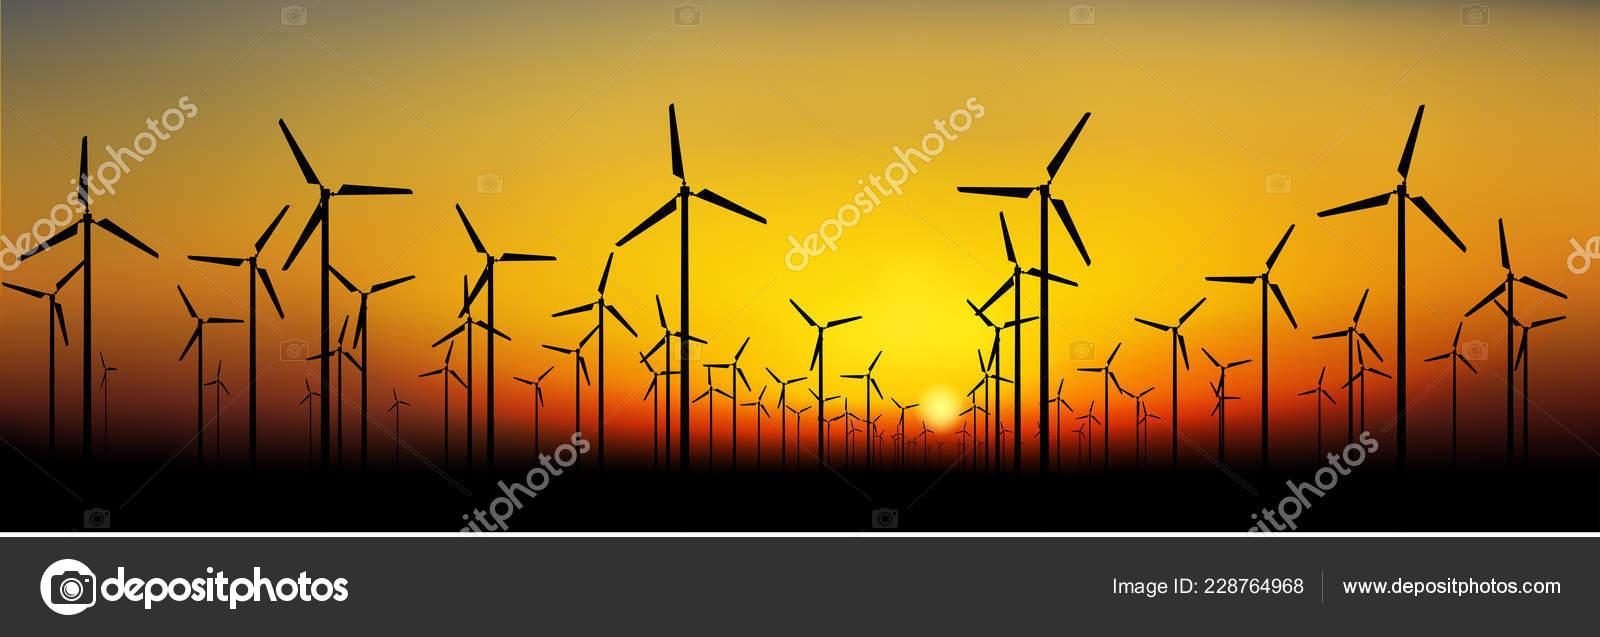 Silhouettes Wind Turbines Sunset Sky Stock Vector Black Mts Power Turbine Diagram